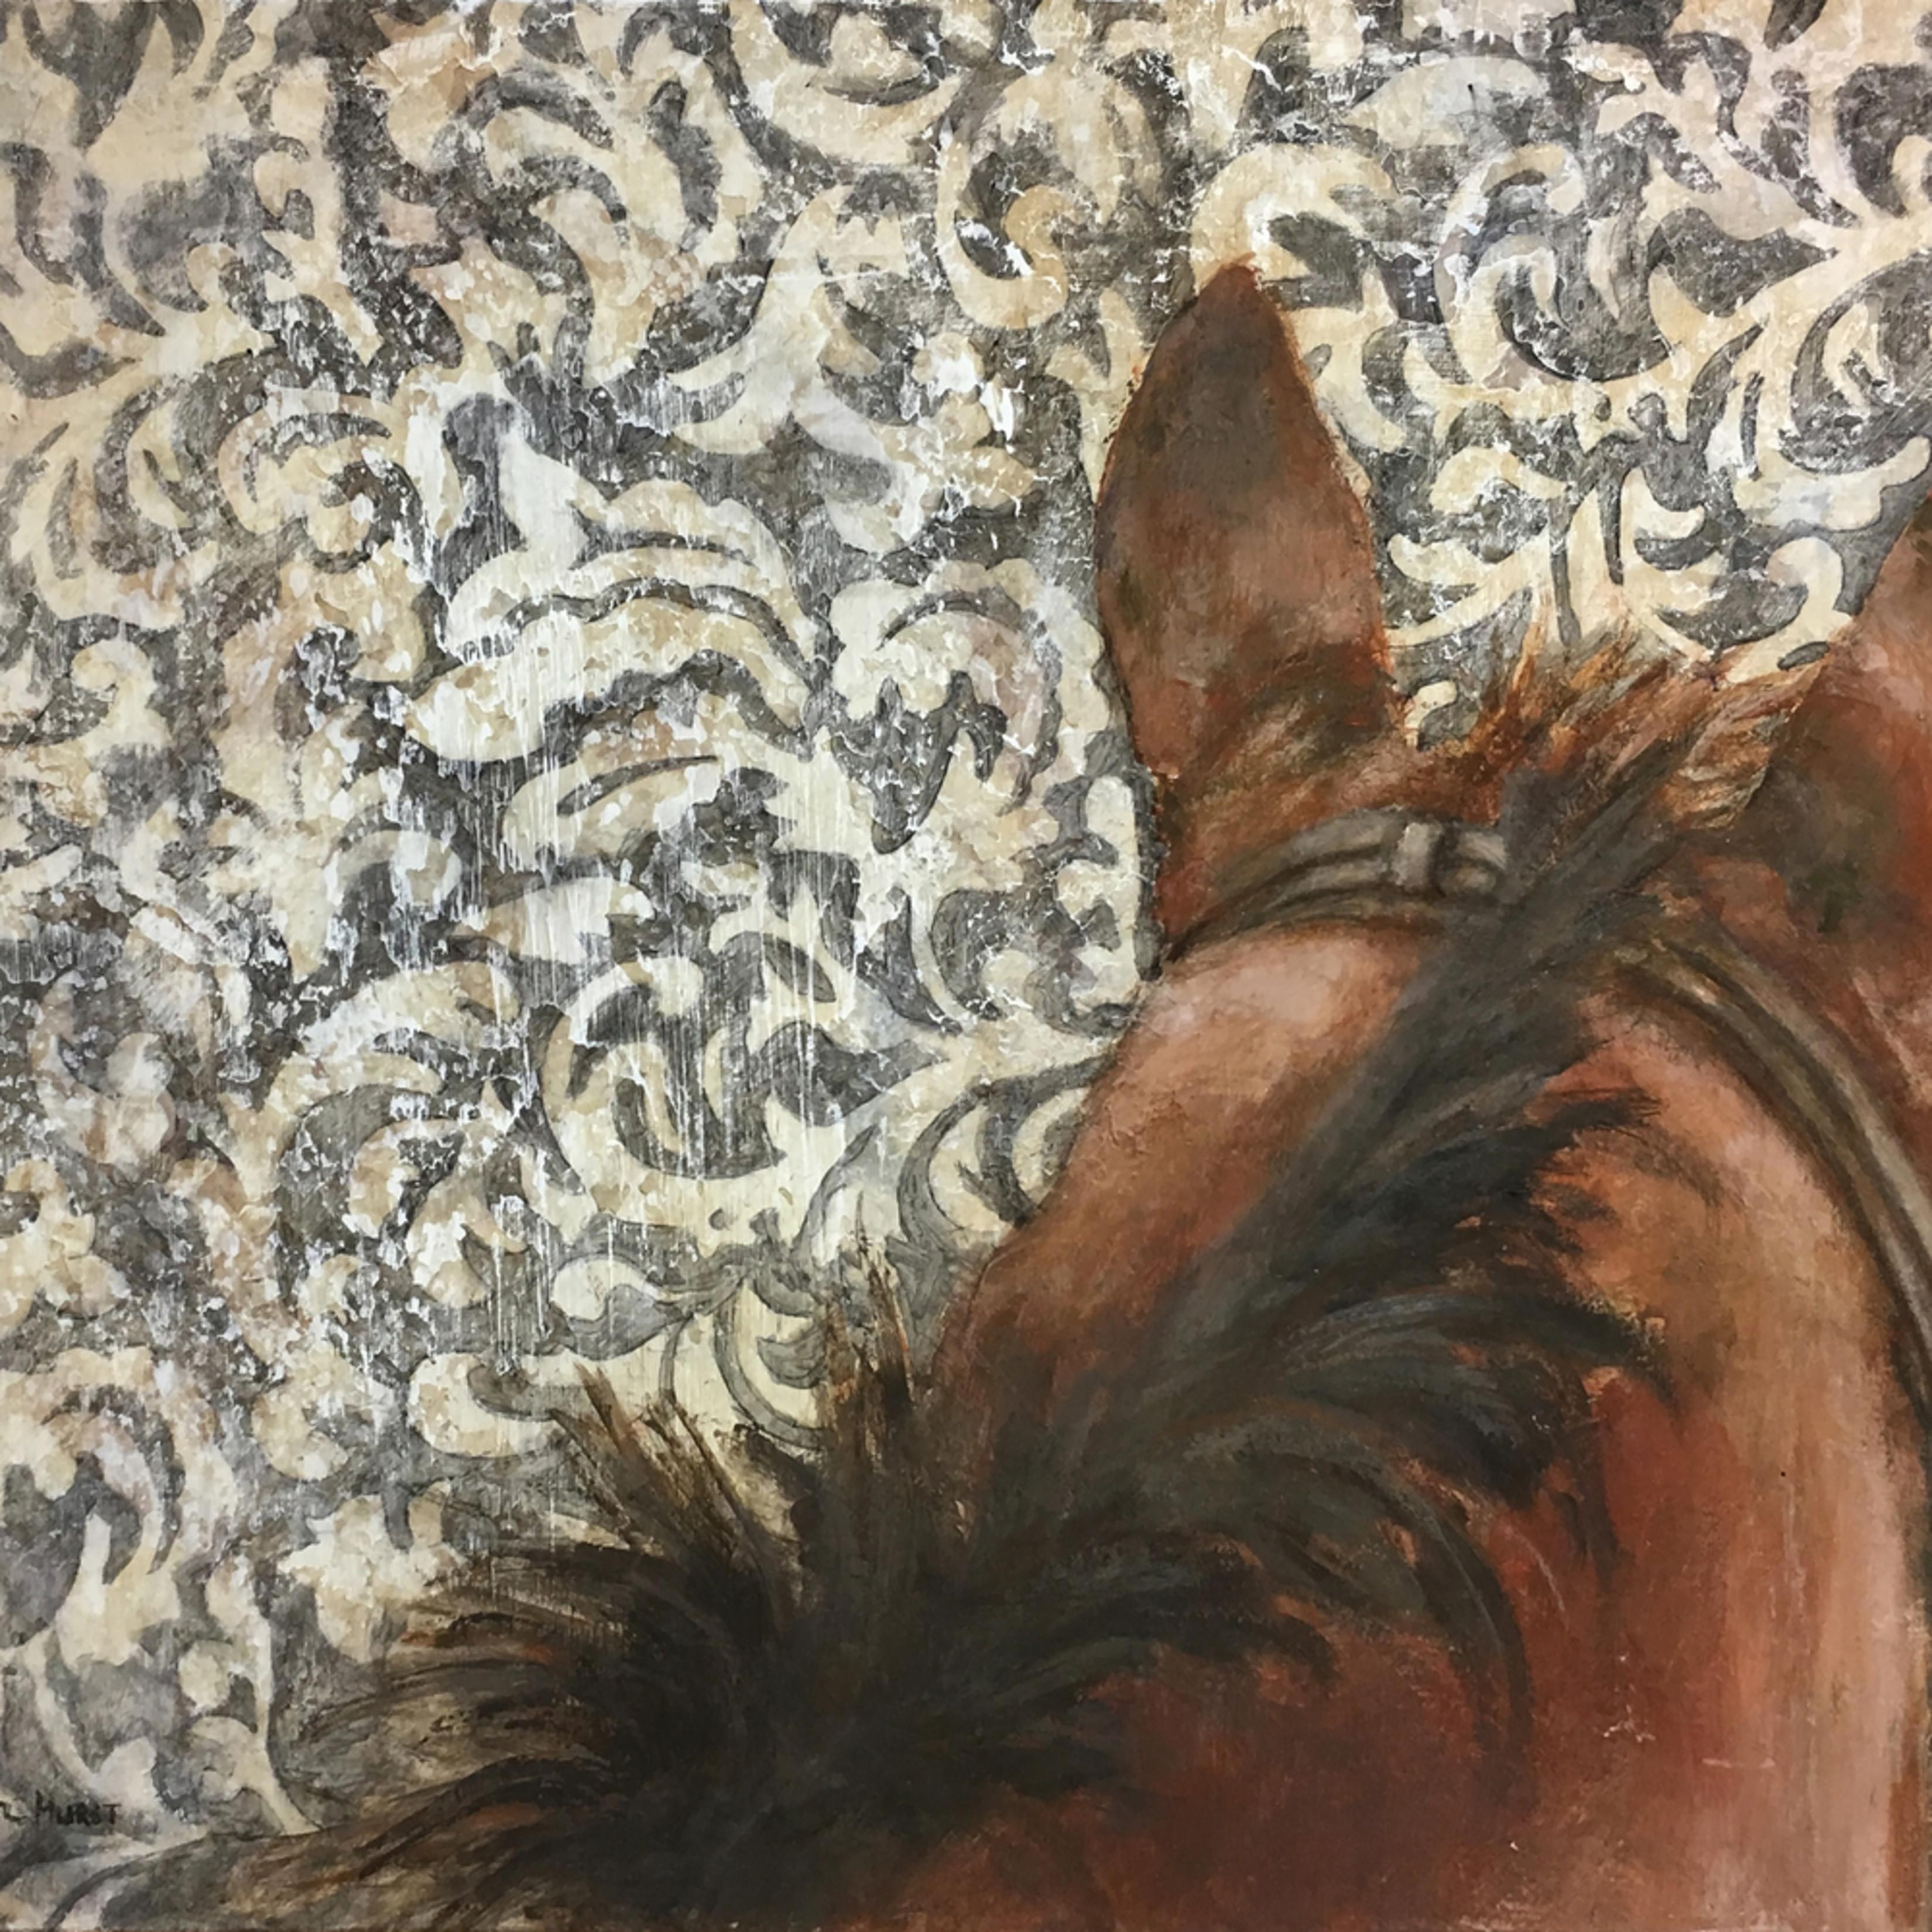 Horse dreams jxspkd